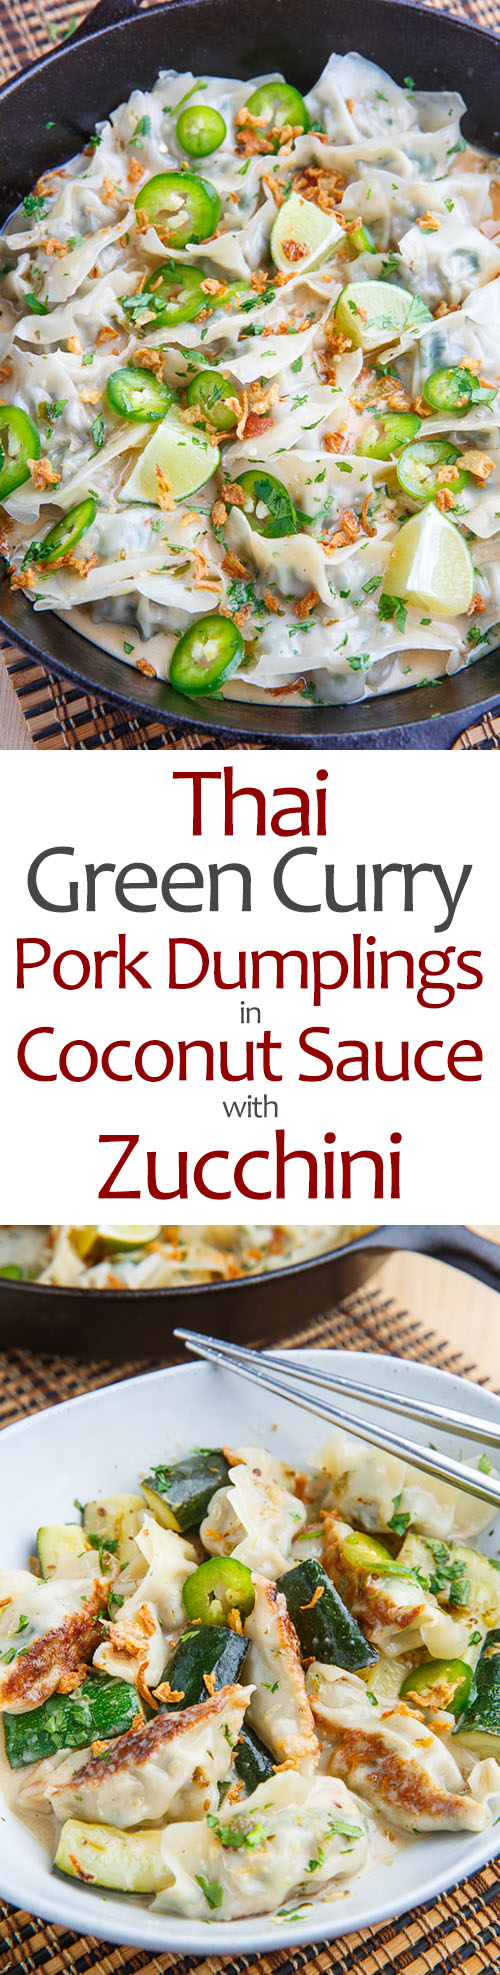 Thai Green Curry Pork Dumplings in Coconut Sauce with Zucchini